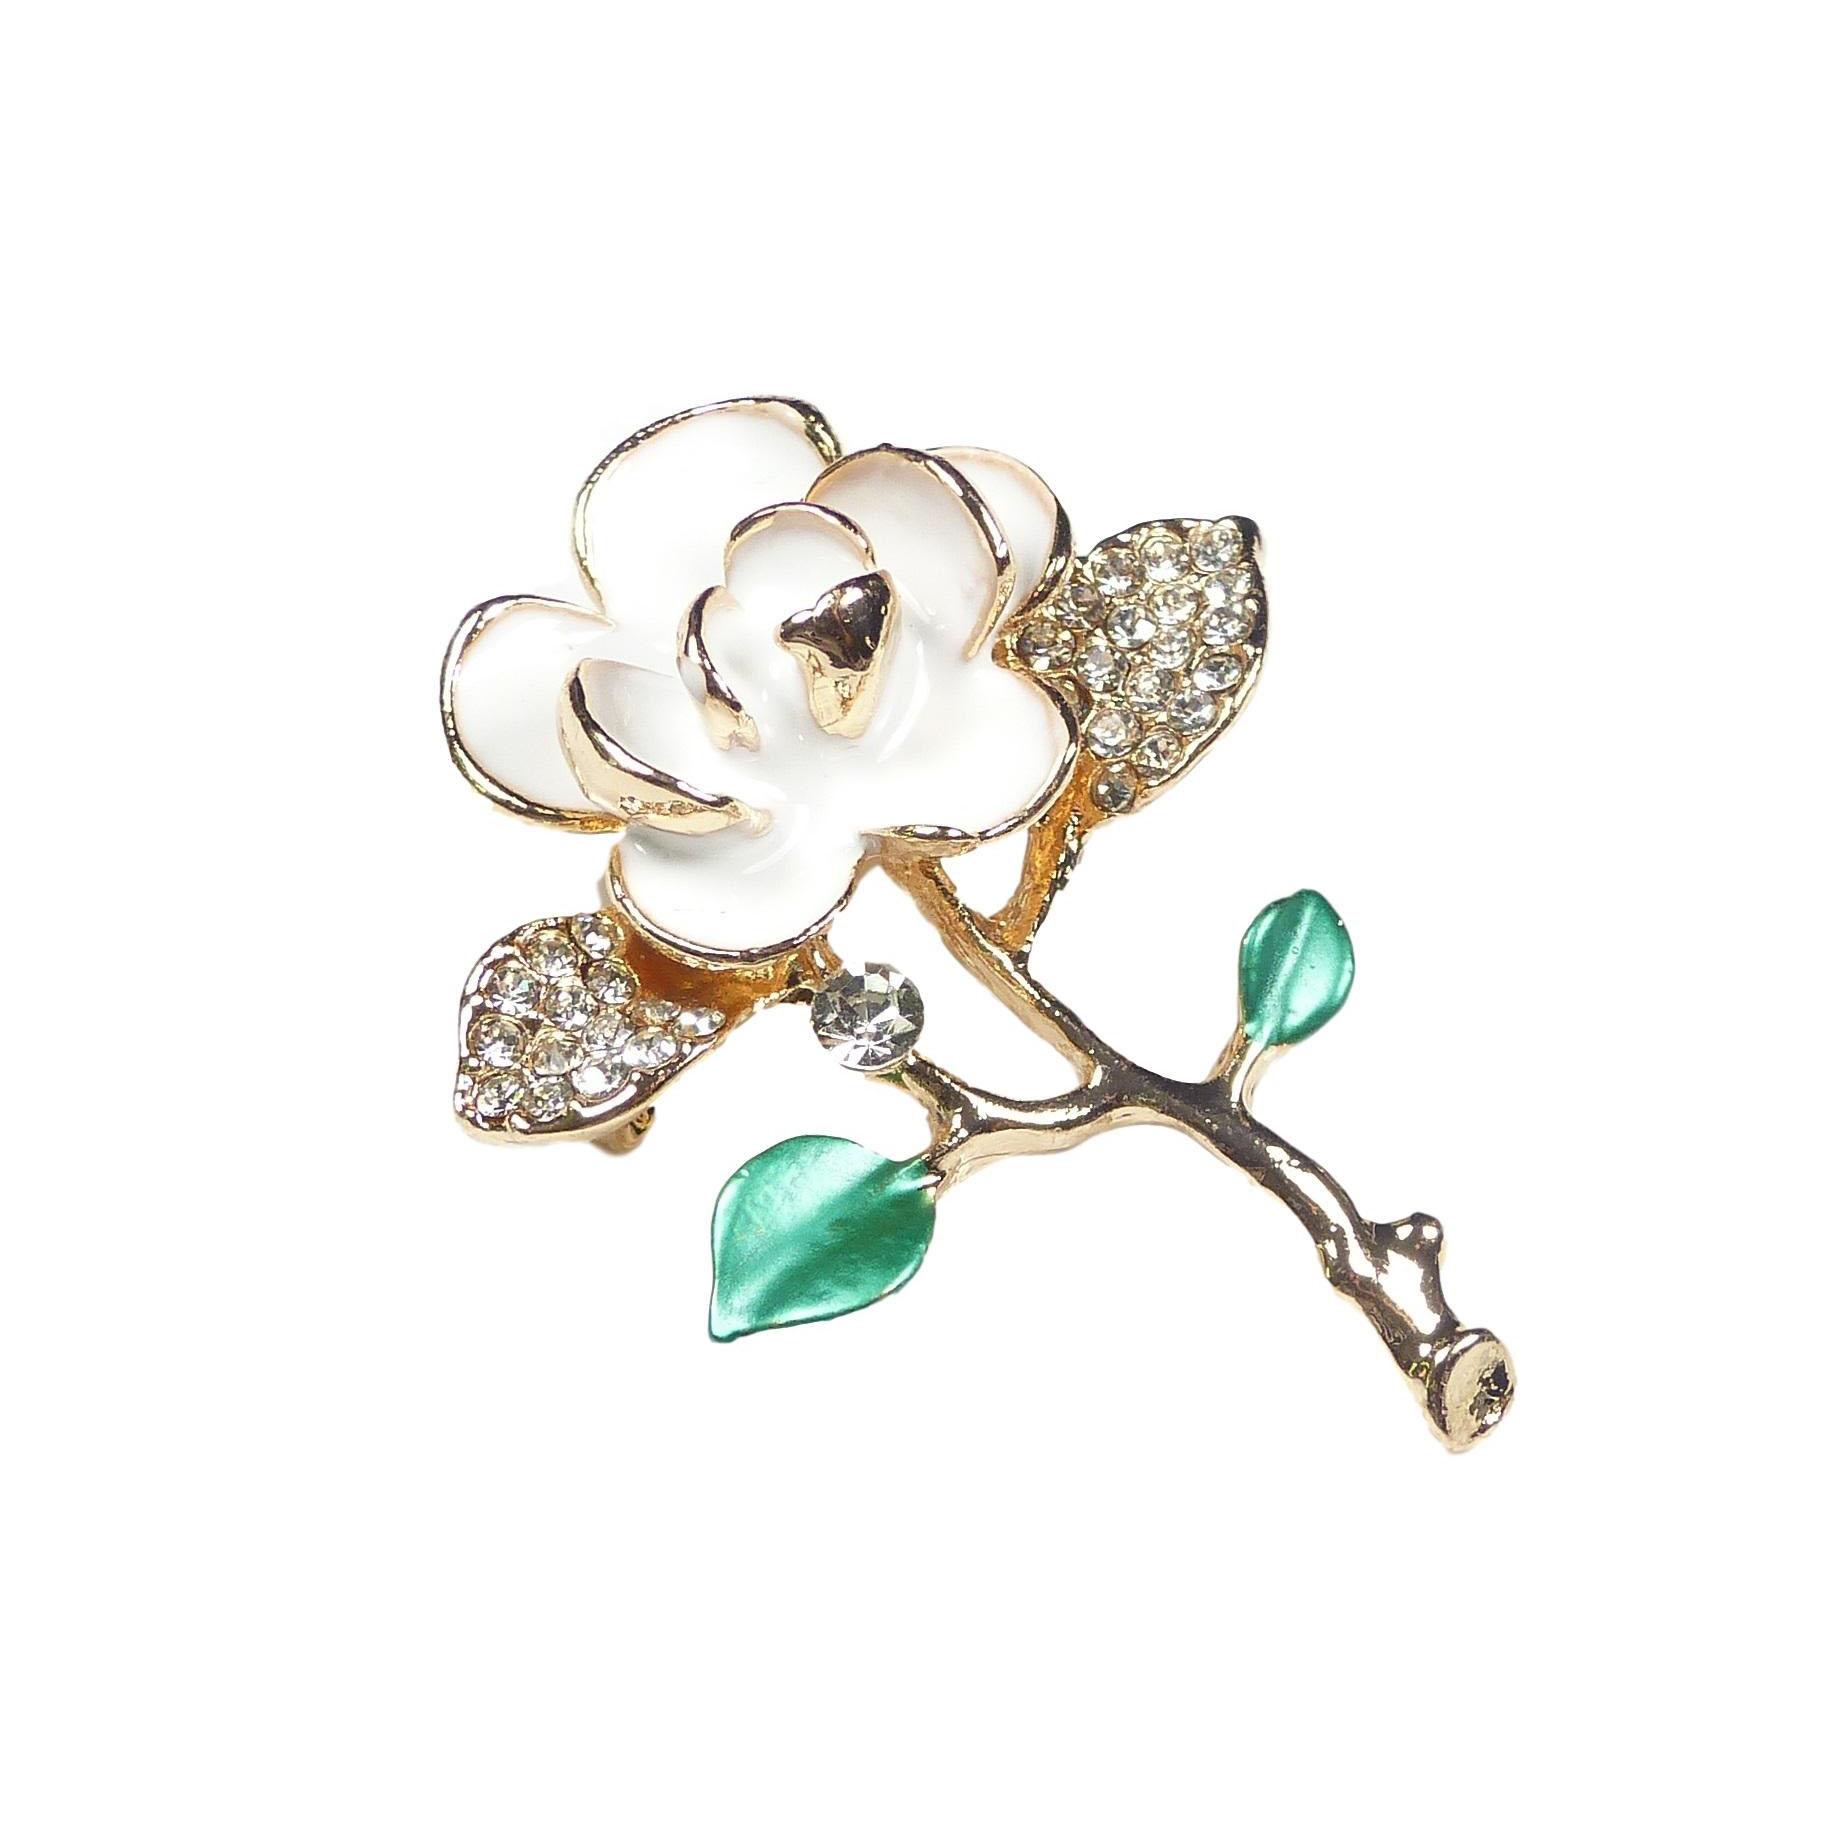 d62a8e202c3 White Enamel Flower Brooch Pin Gold & Diamante Rhinestones   Syntego